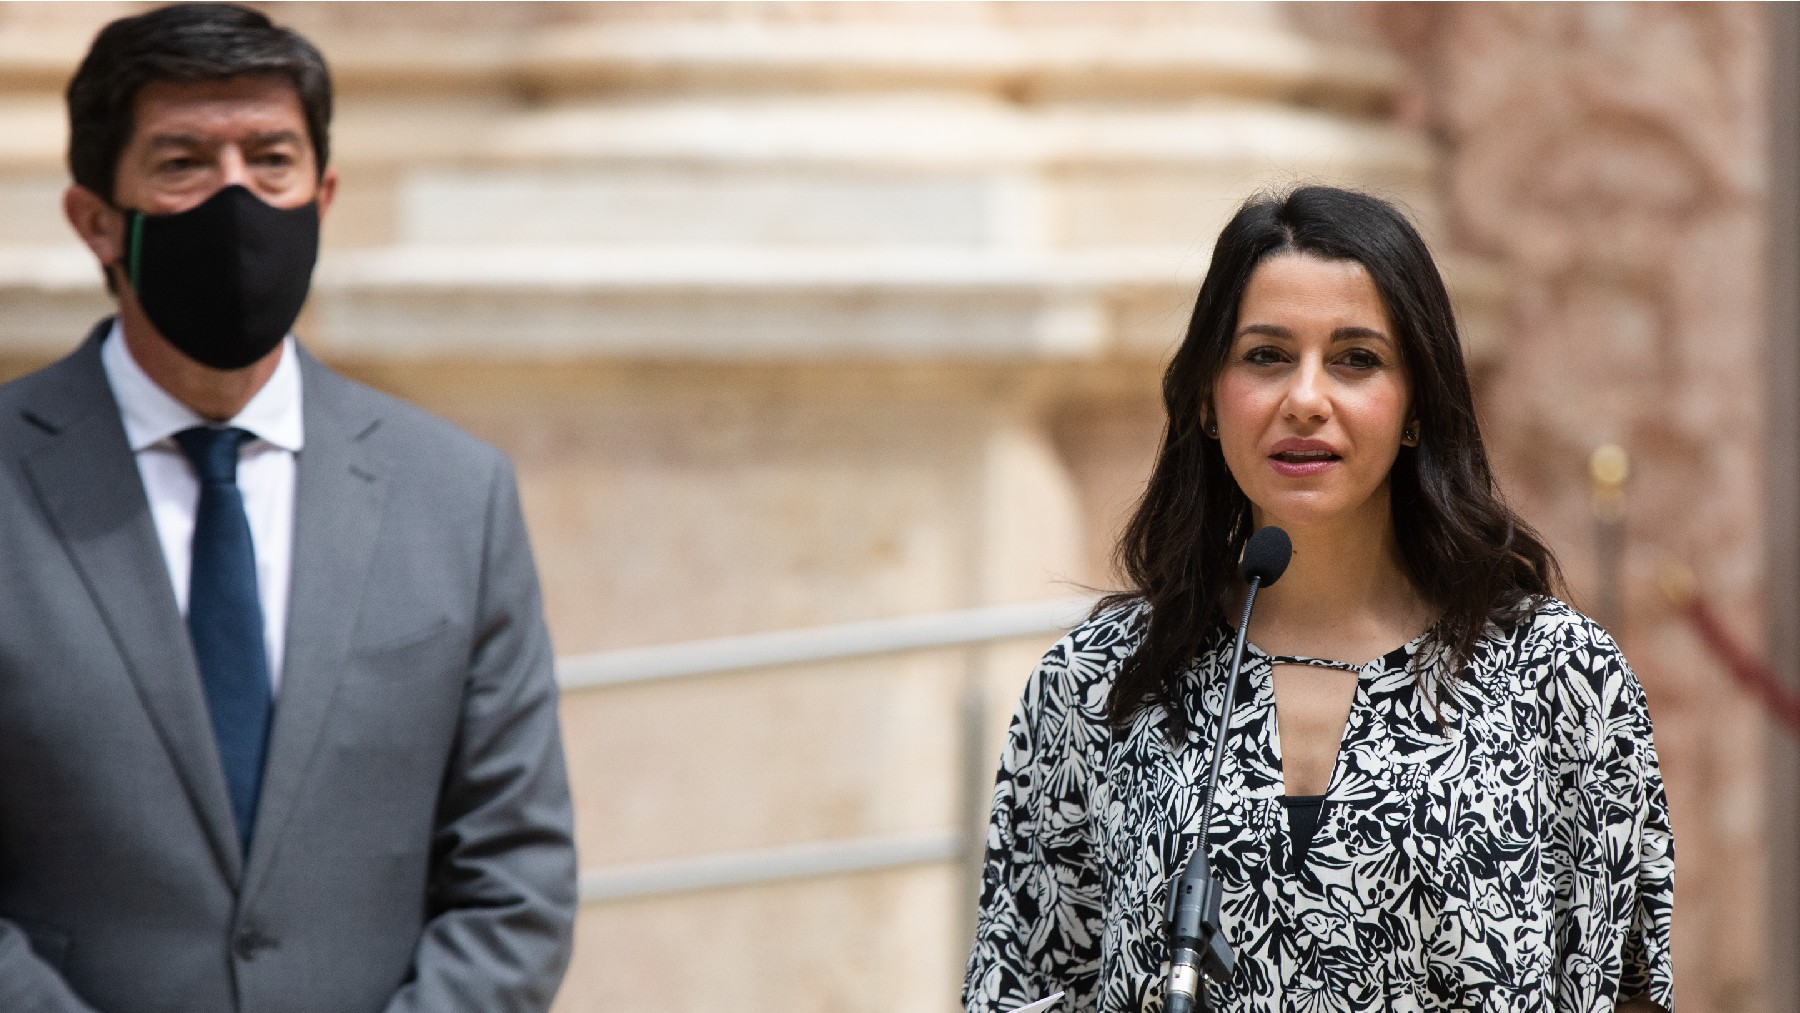 Inés Arrimadas y Juan Marín (Foto: EP)